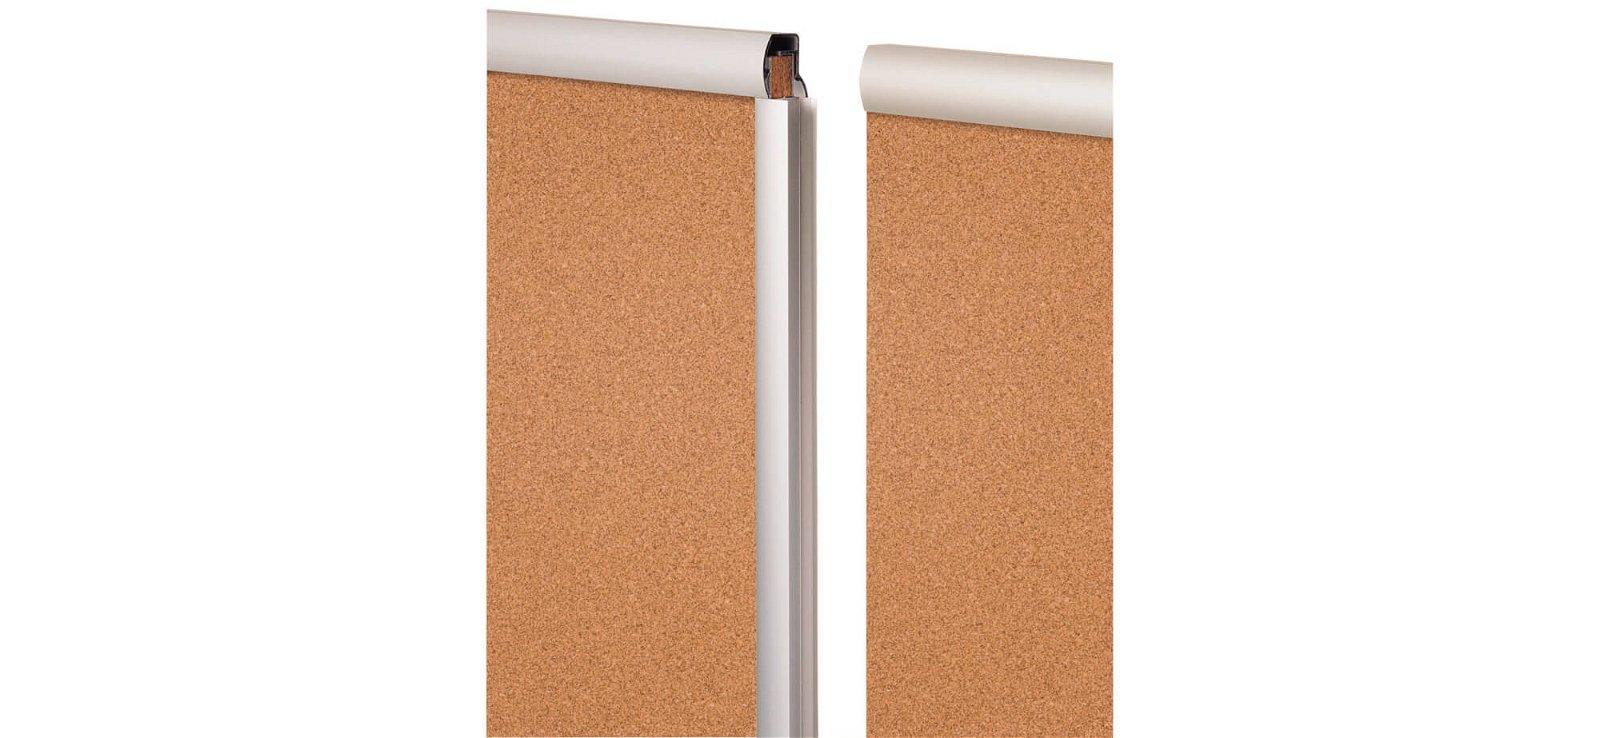 Endlos-Pinnboard, Kork, Erwei- terung, 120x90 cm, hoch, grau